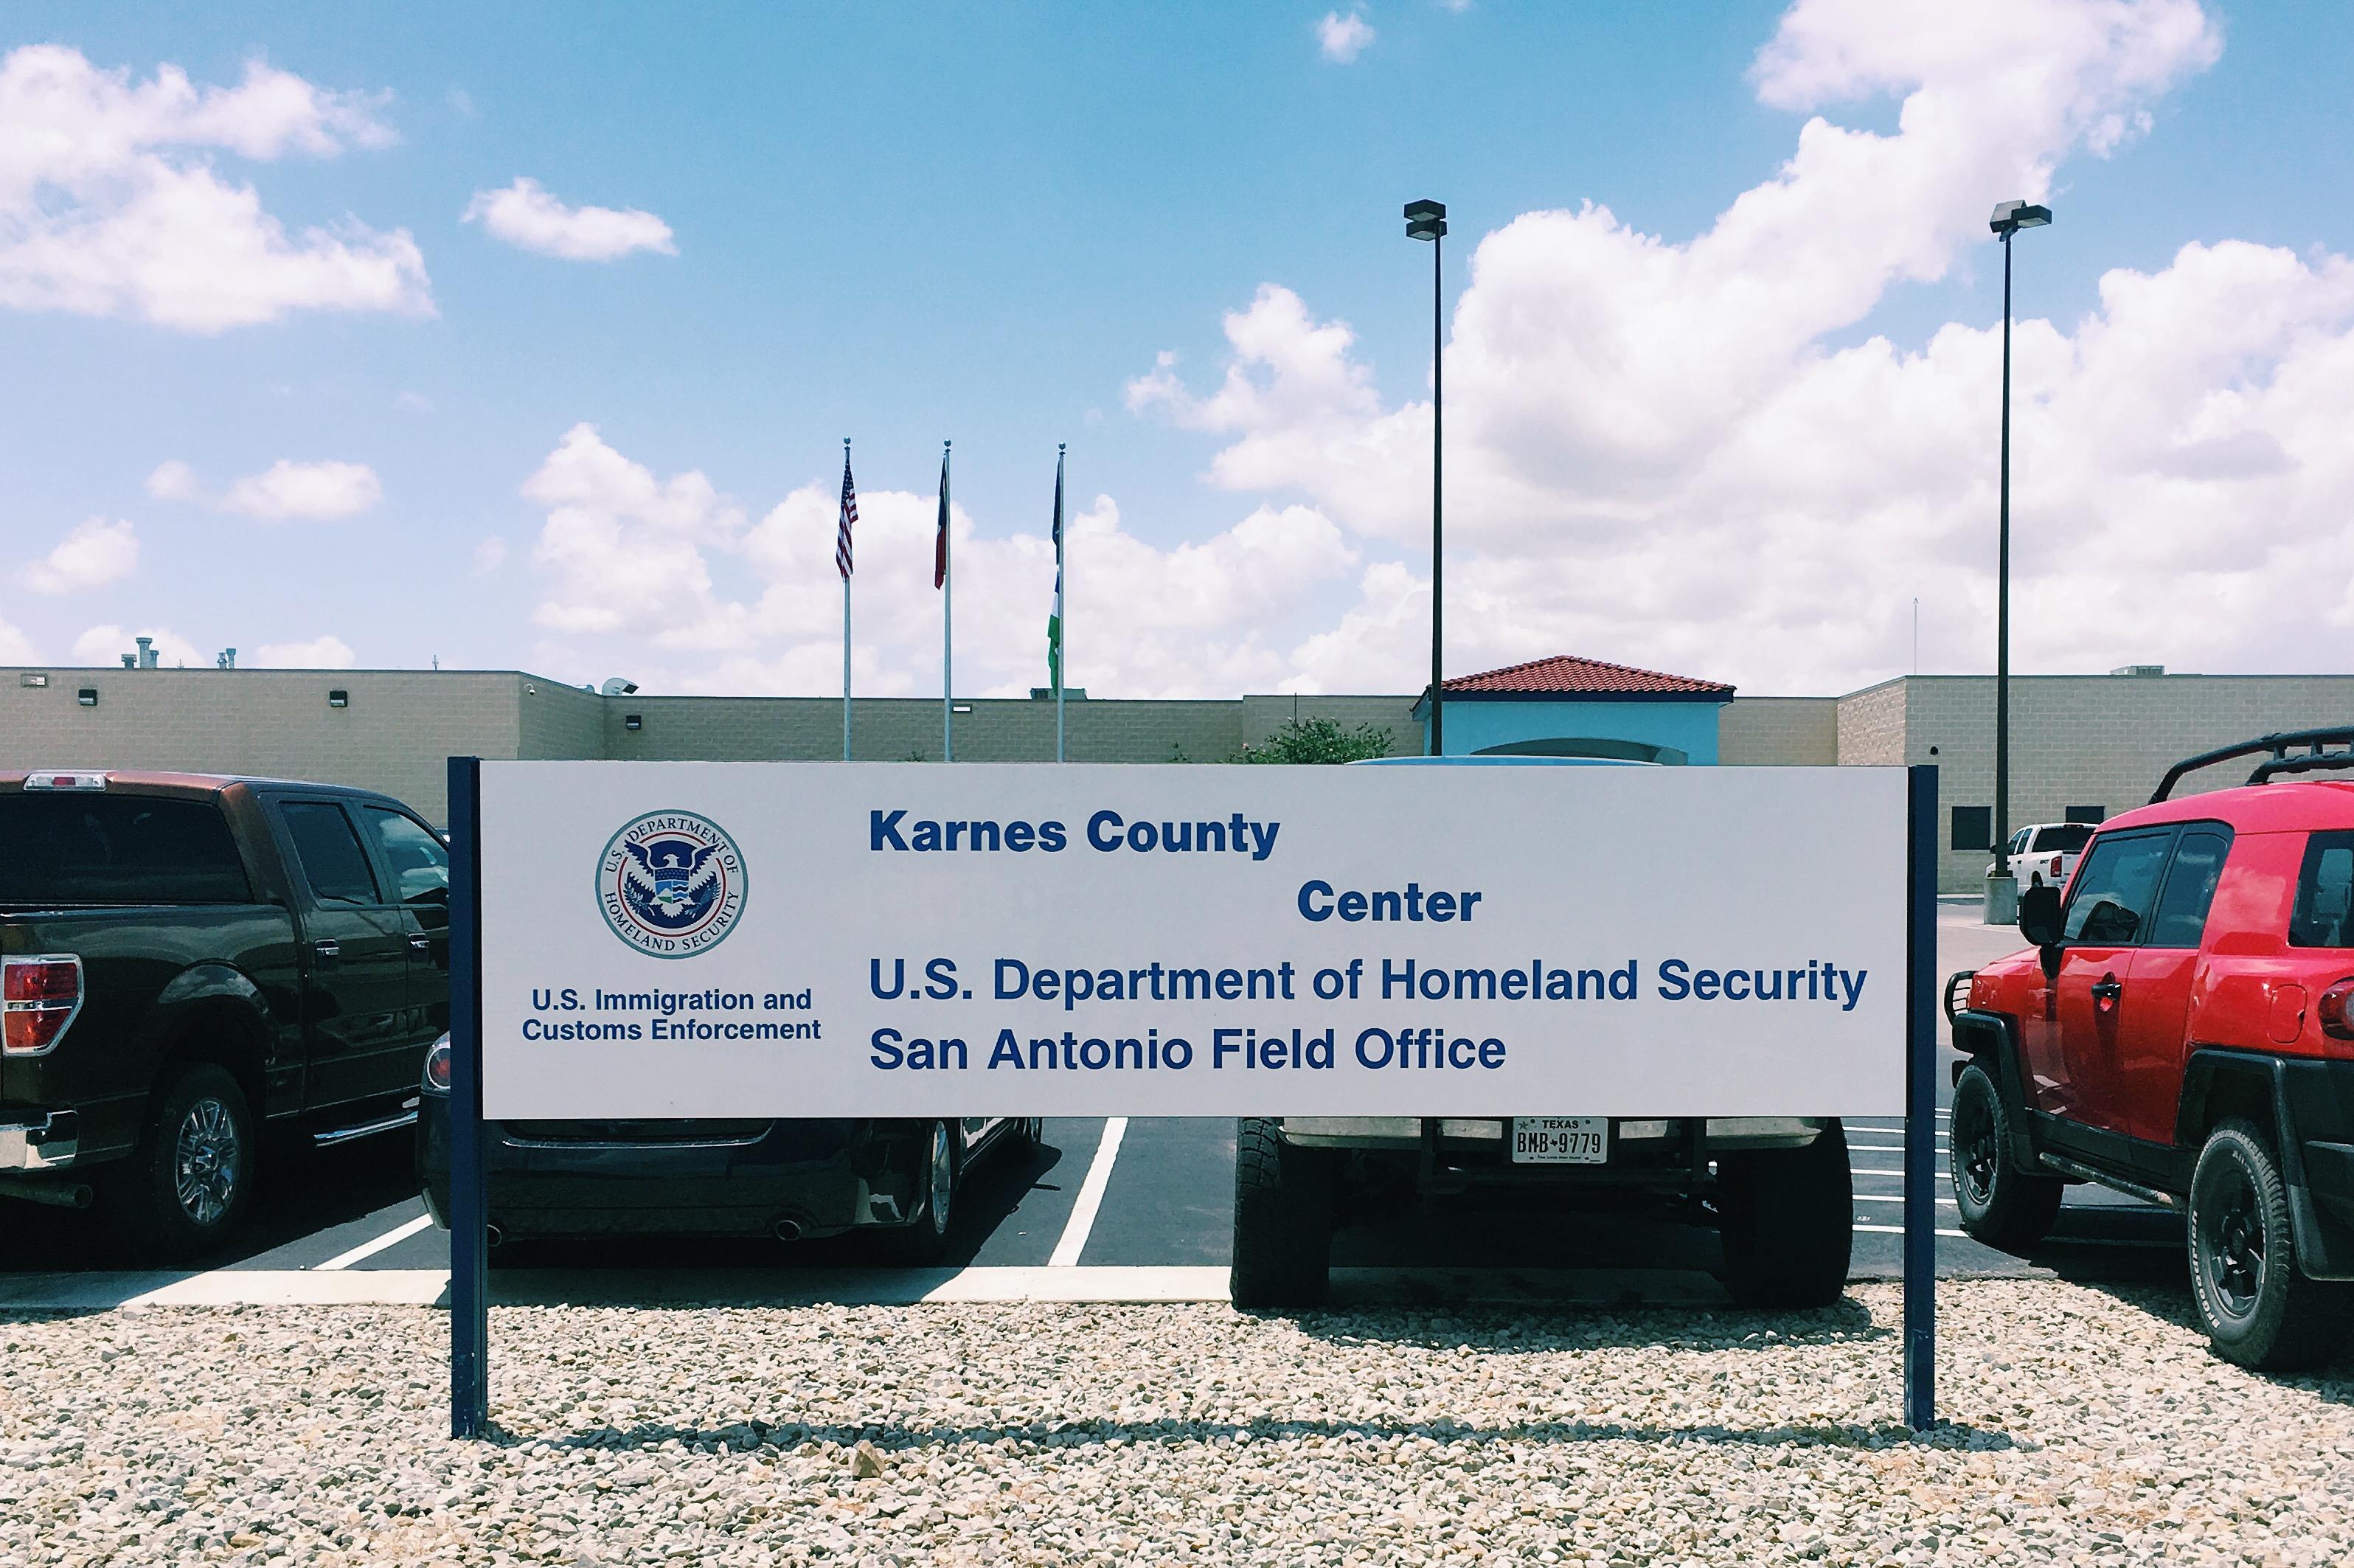 sign for Karnes County Center